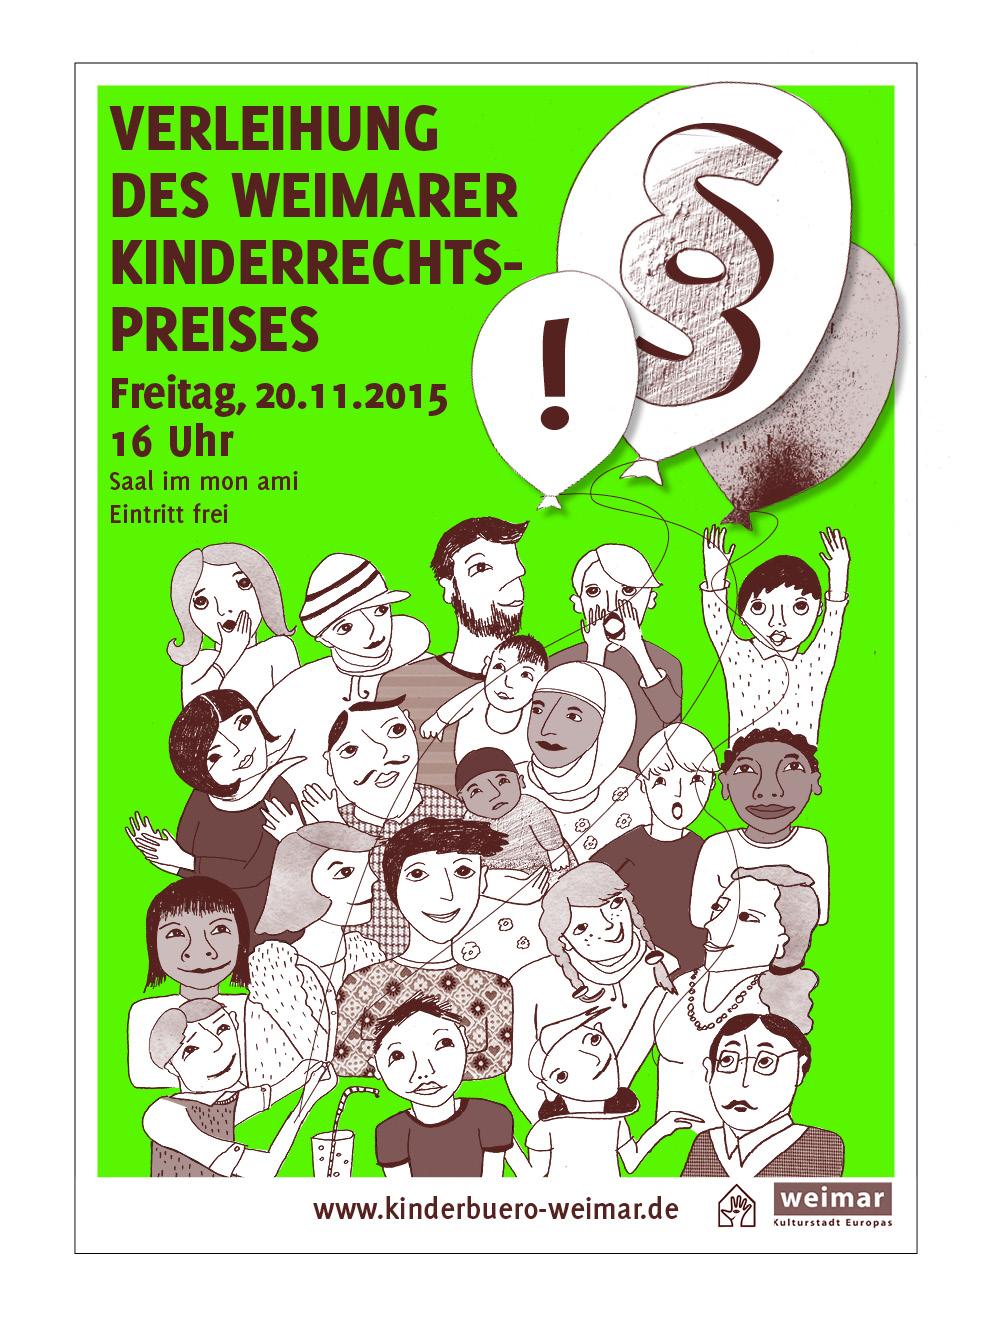 Kinderbüro // Plakat / Kinderrechtspreisvereihung